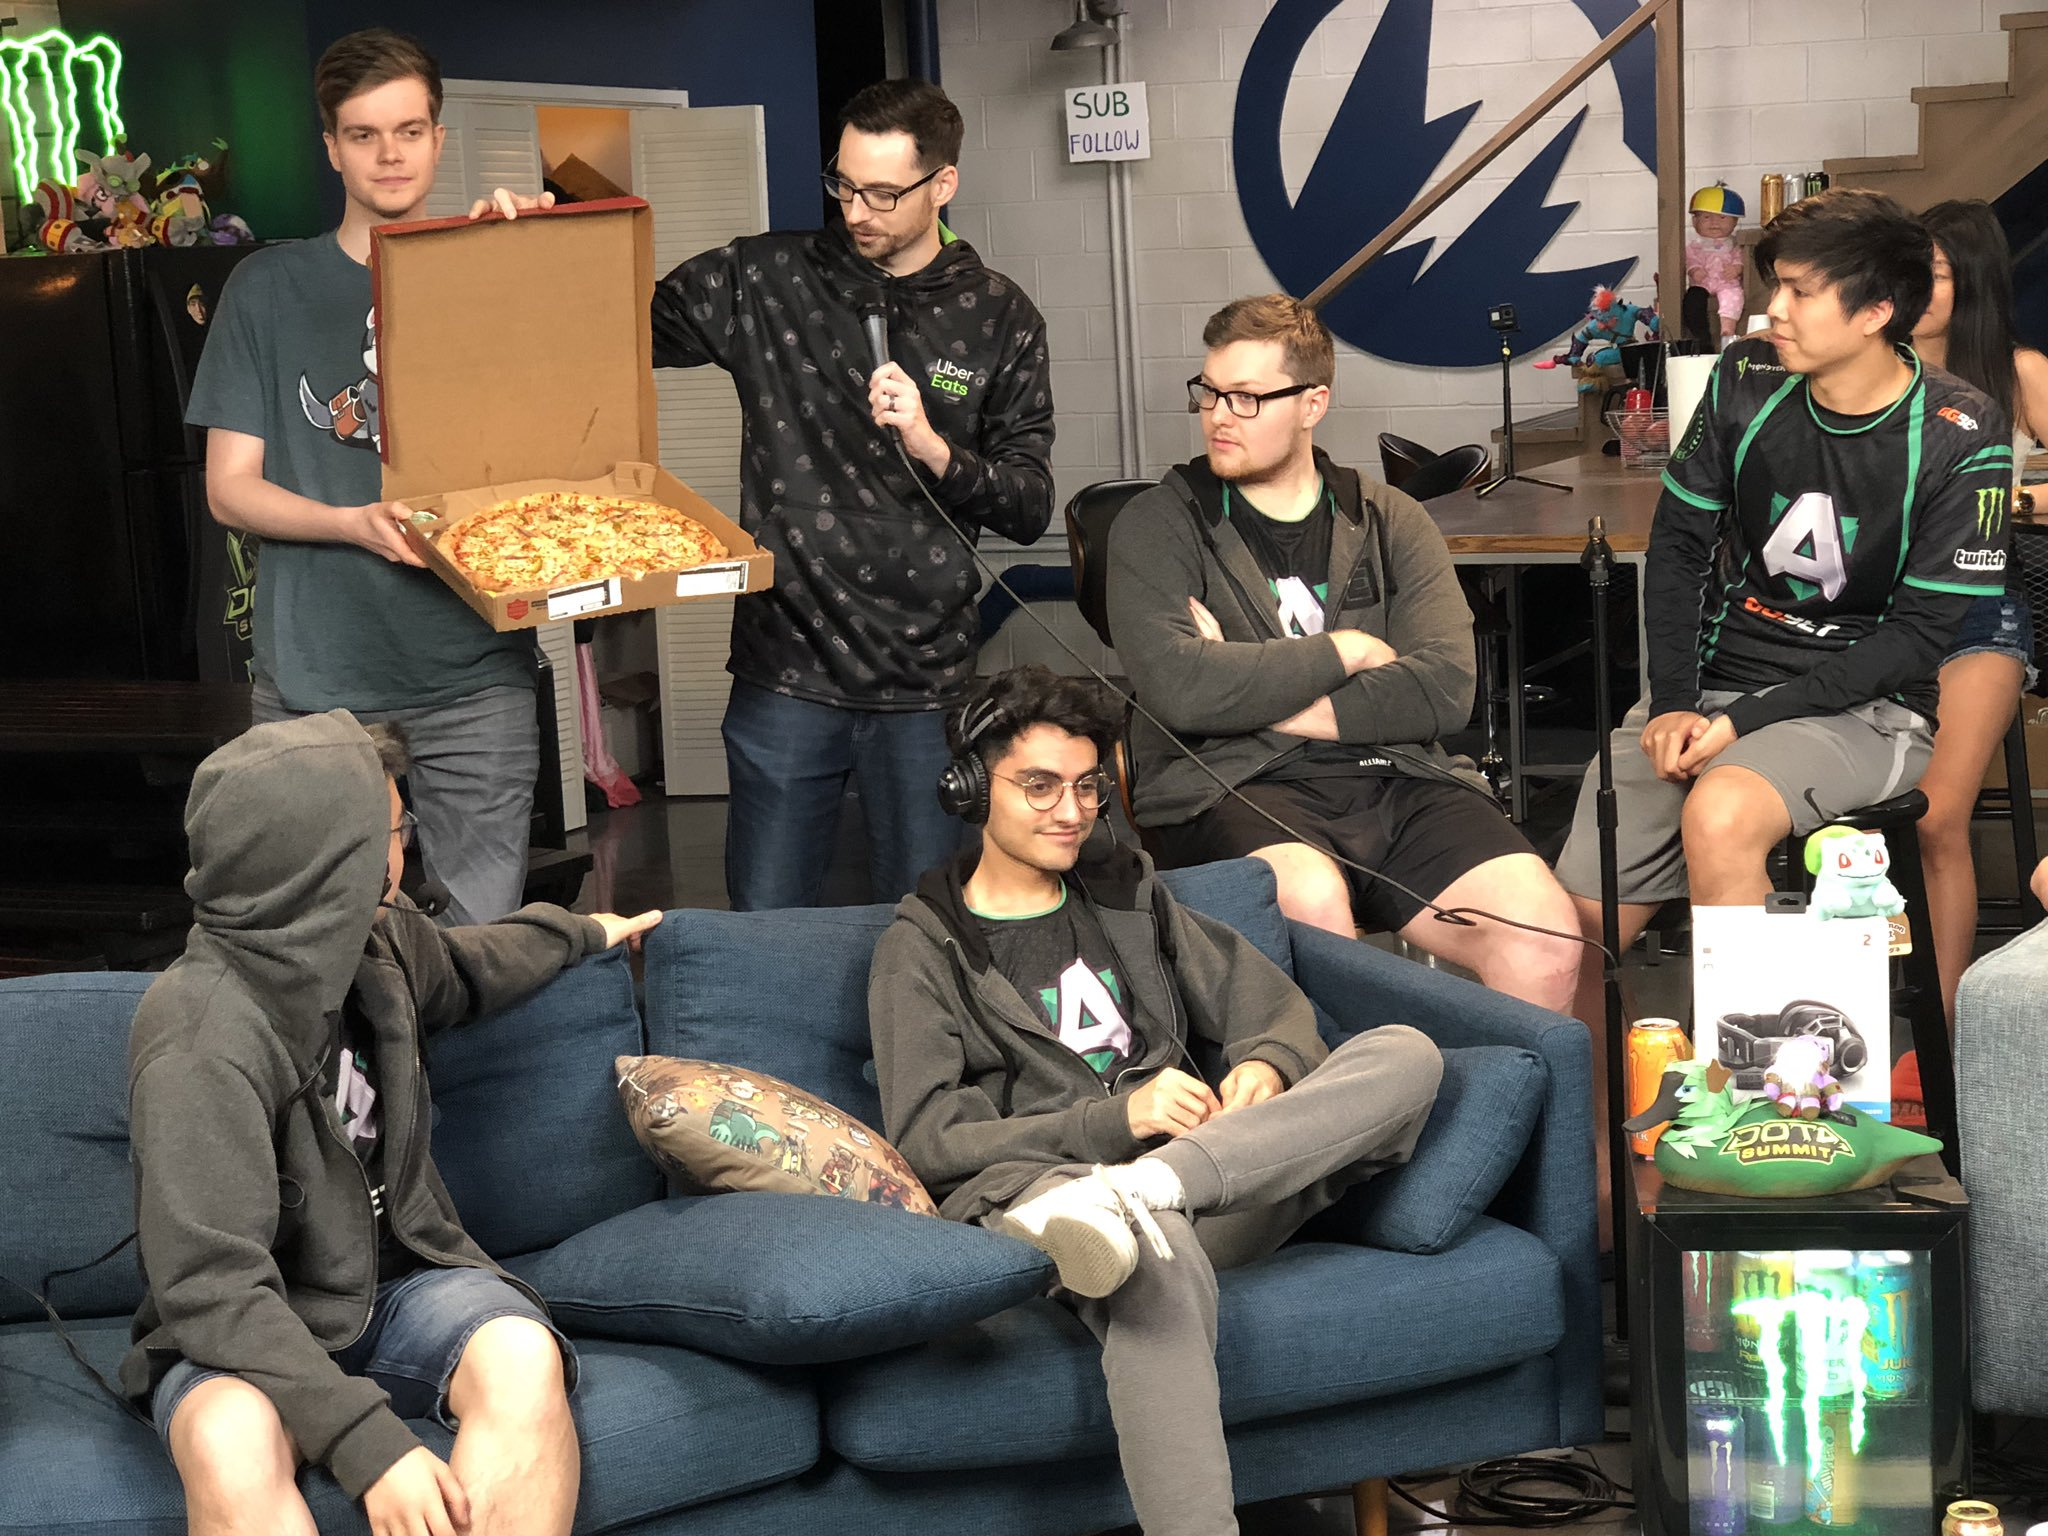 Alliance sweep paiN Gaming to win Dota Summit 10 | Dot Esports